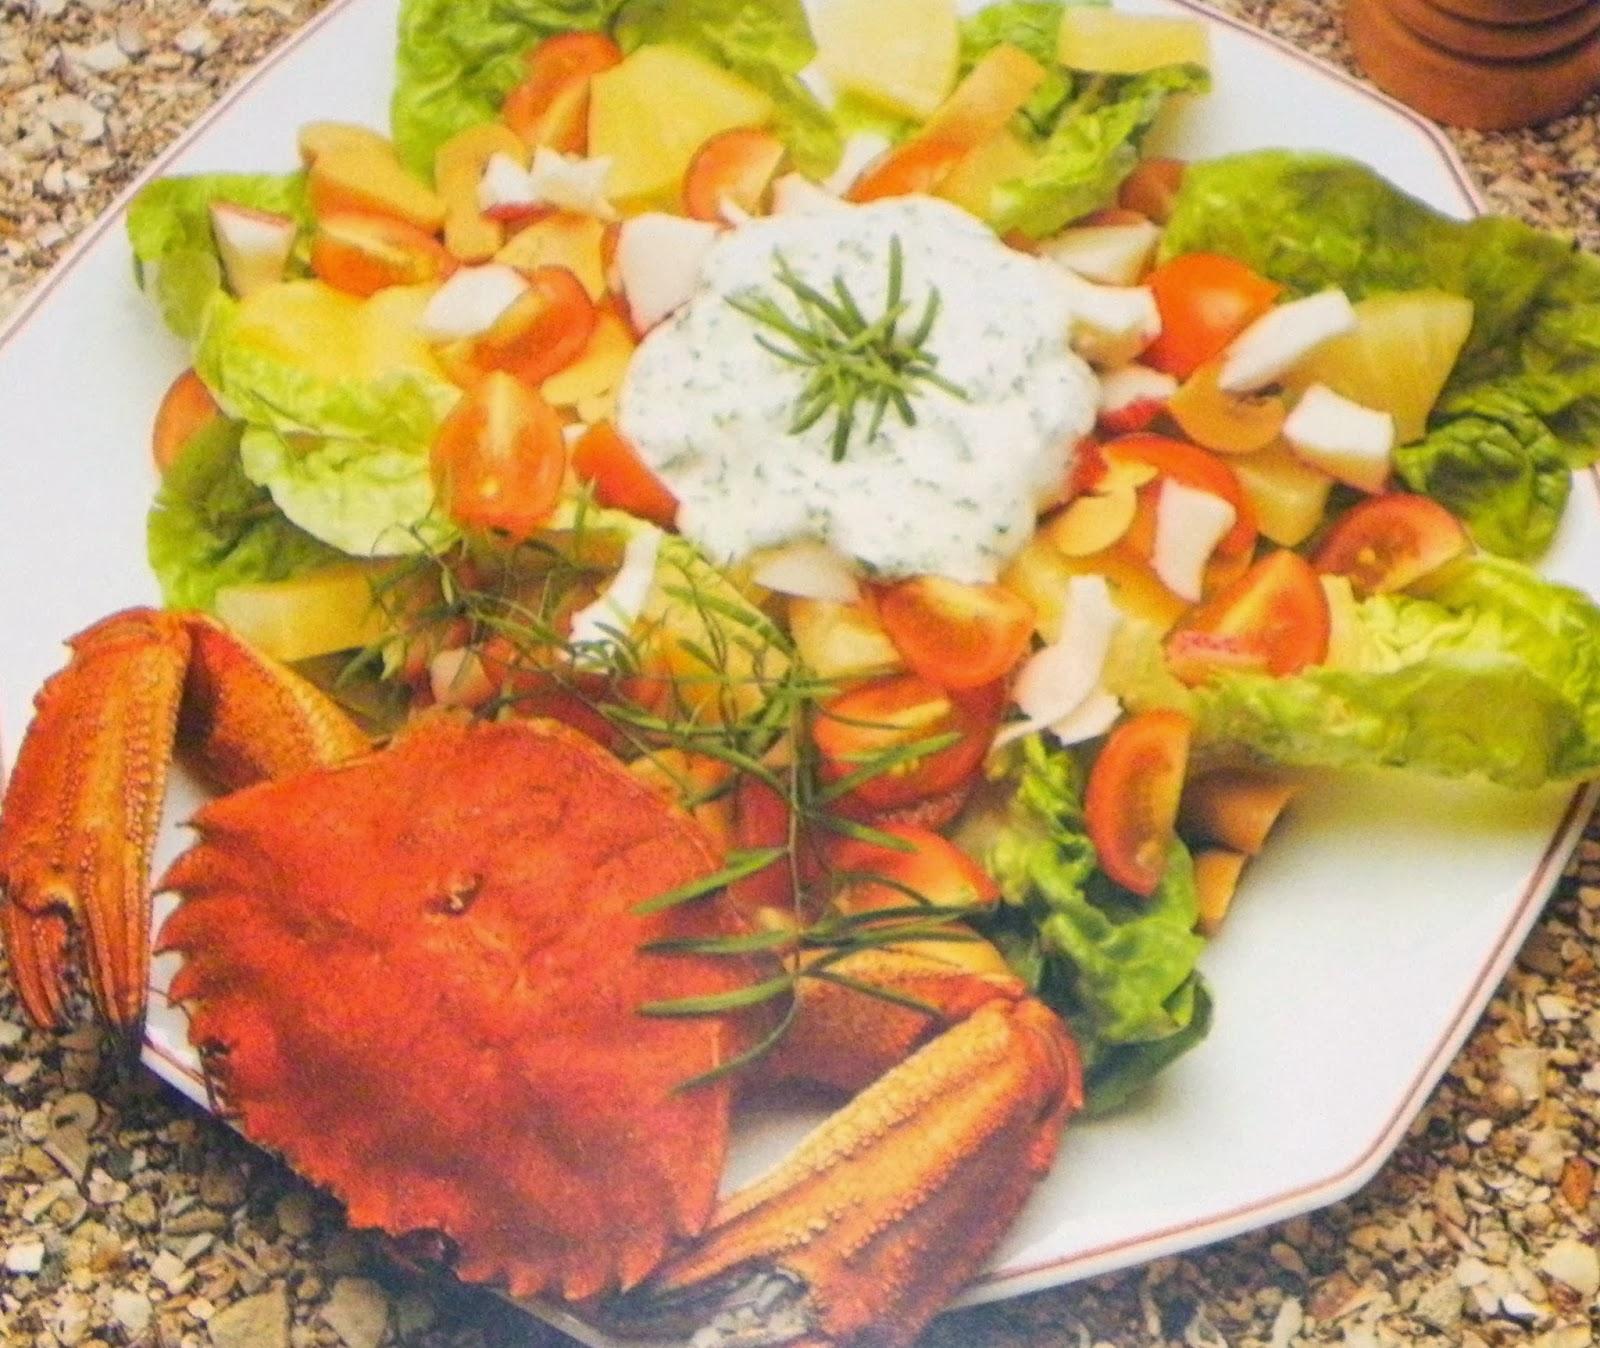 la cuisine m diterran enne salade de crabe la sauce d 39 aneth. Black Bedroom Furniture Sets. Home Design Ideas